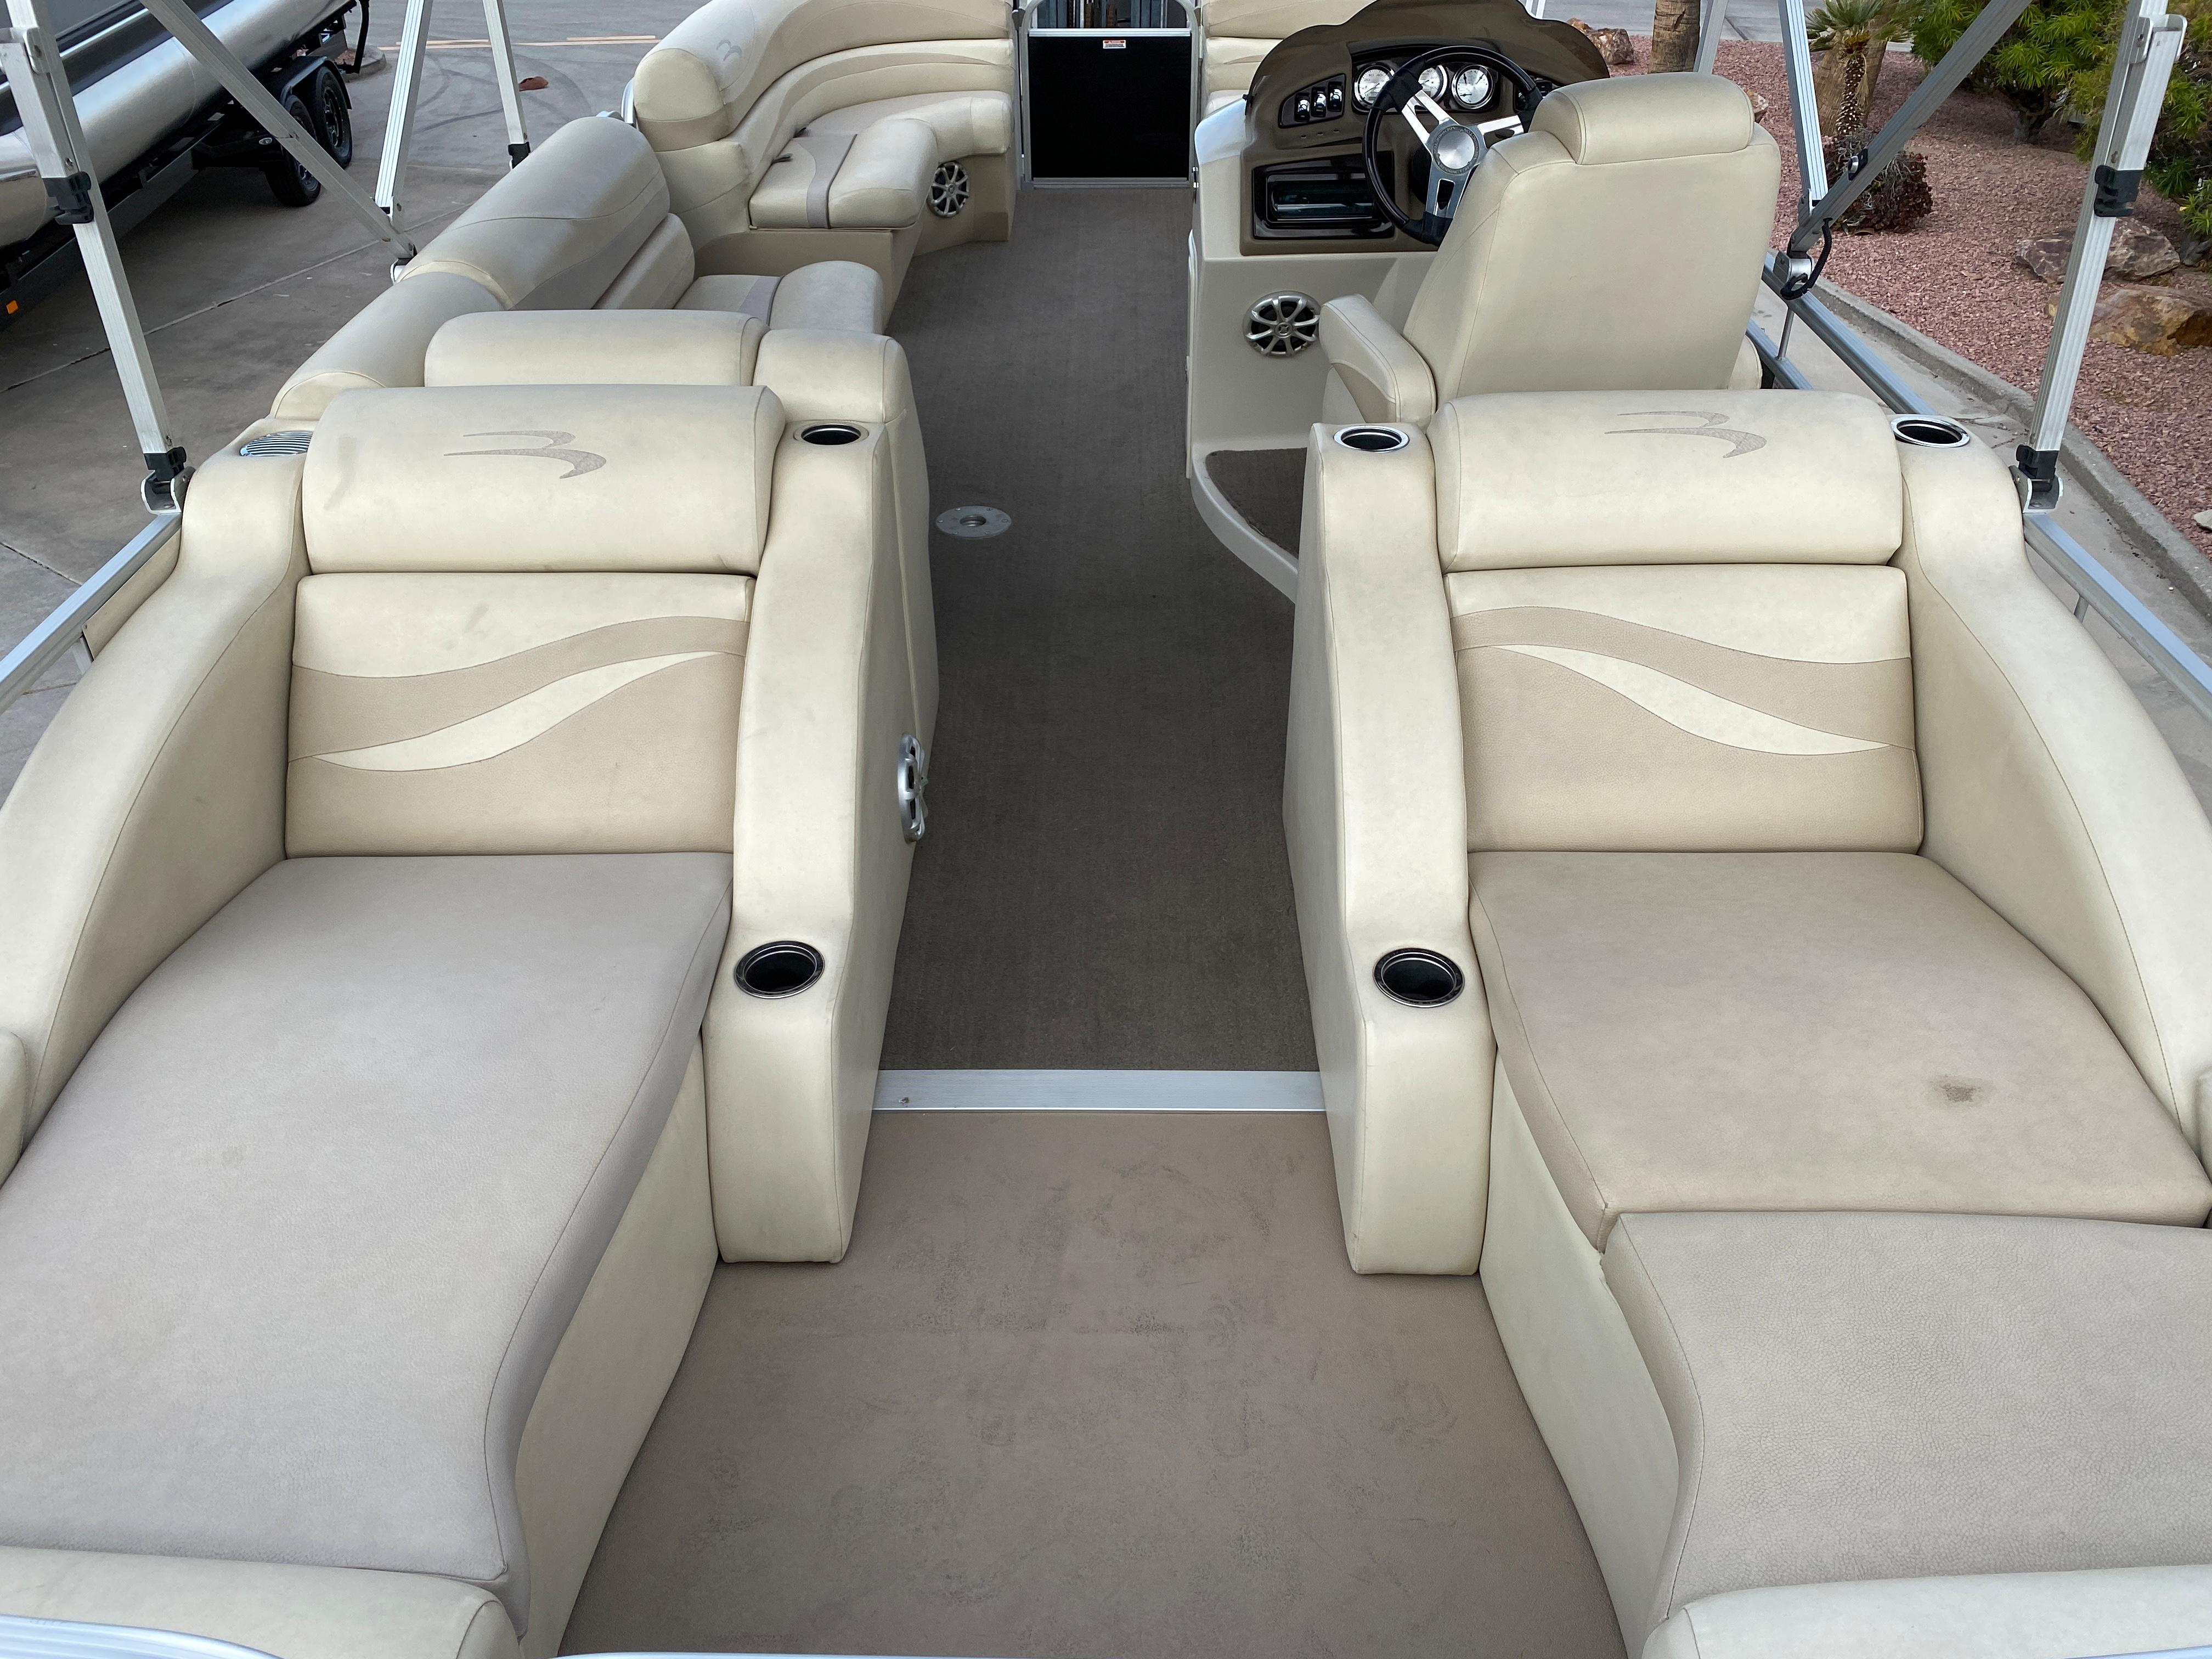 2012 Bennington 2275 GCW #T8098D inventory image at Sun Country Inland in Lake Havasu City